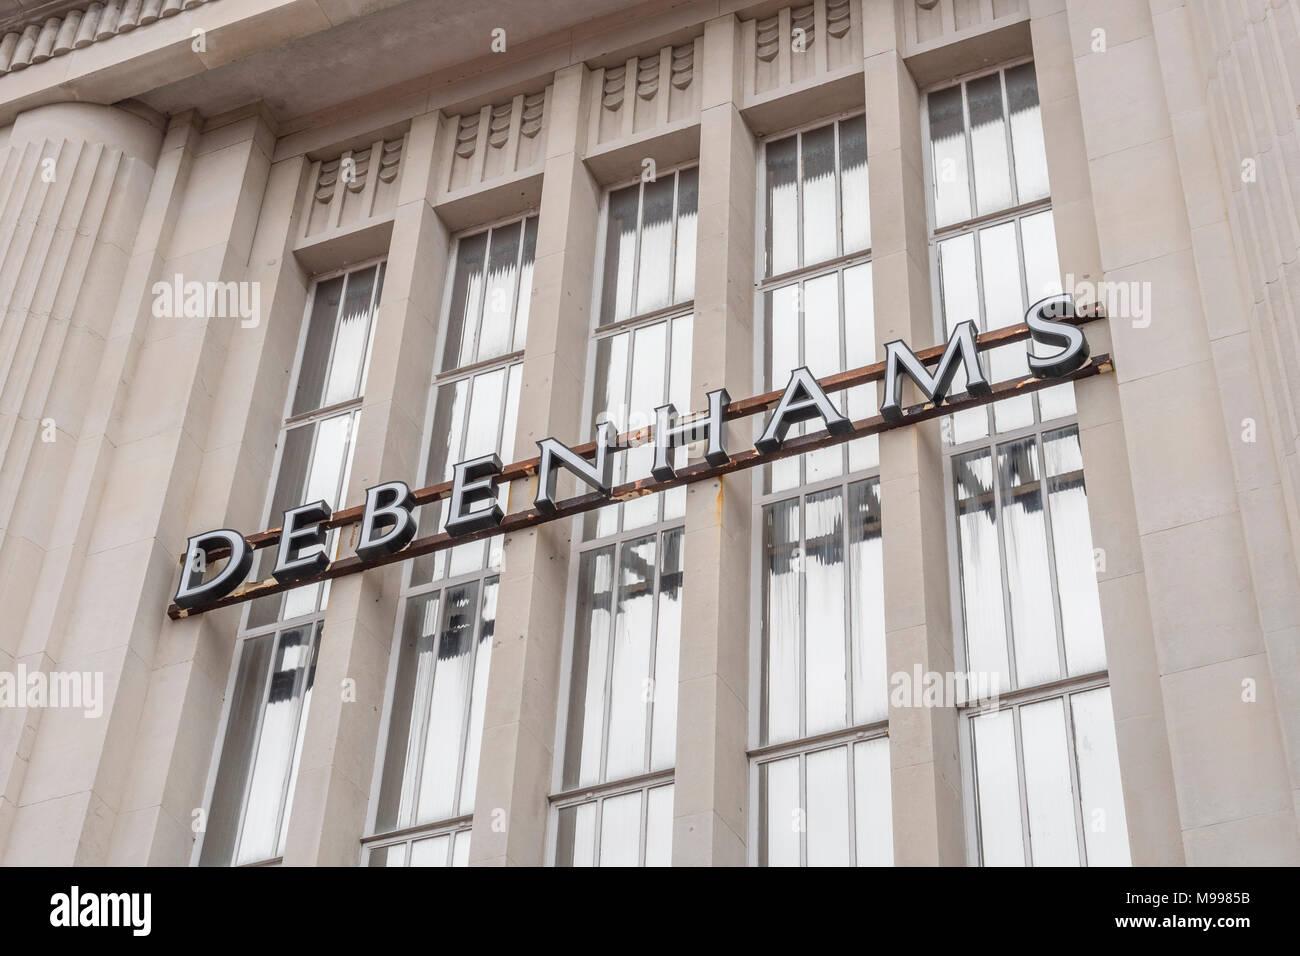 Exterior of Debenhams retail shop in Plymouth with copy space, Devon. Metaphor for 2018 Debenhams profits plunge. Death of the high street concept. Stock Photo